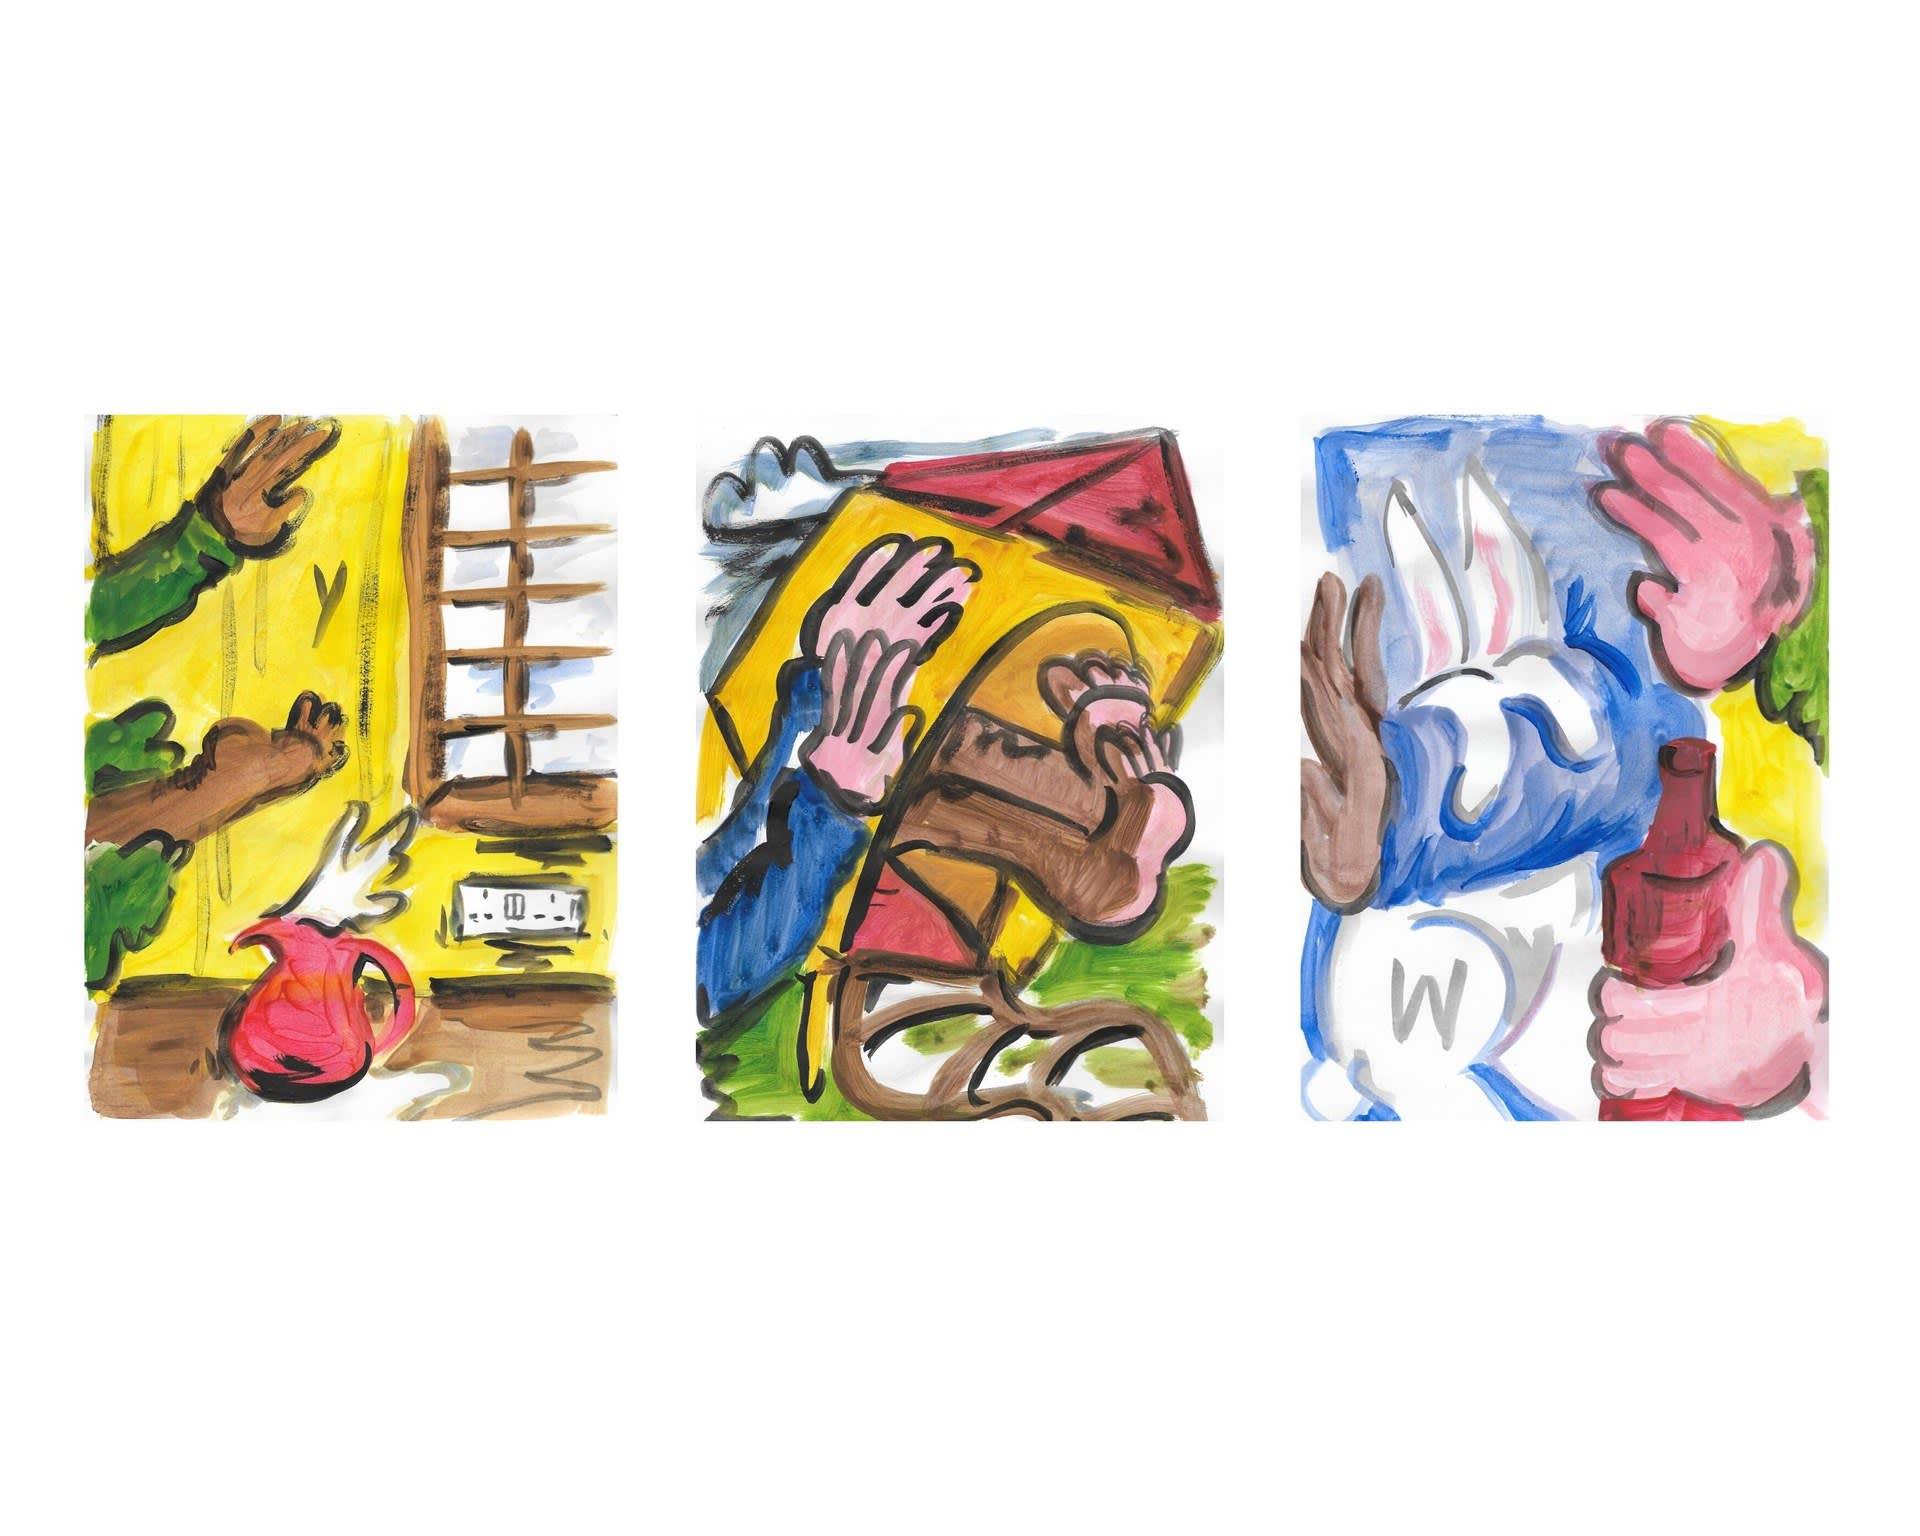 Ban Marie drawings